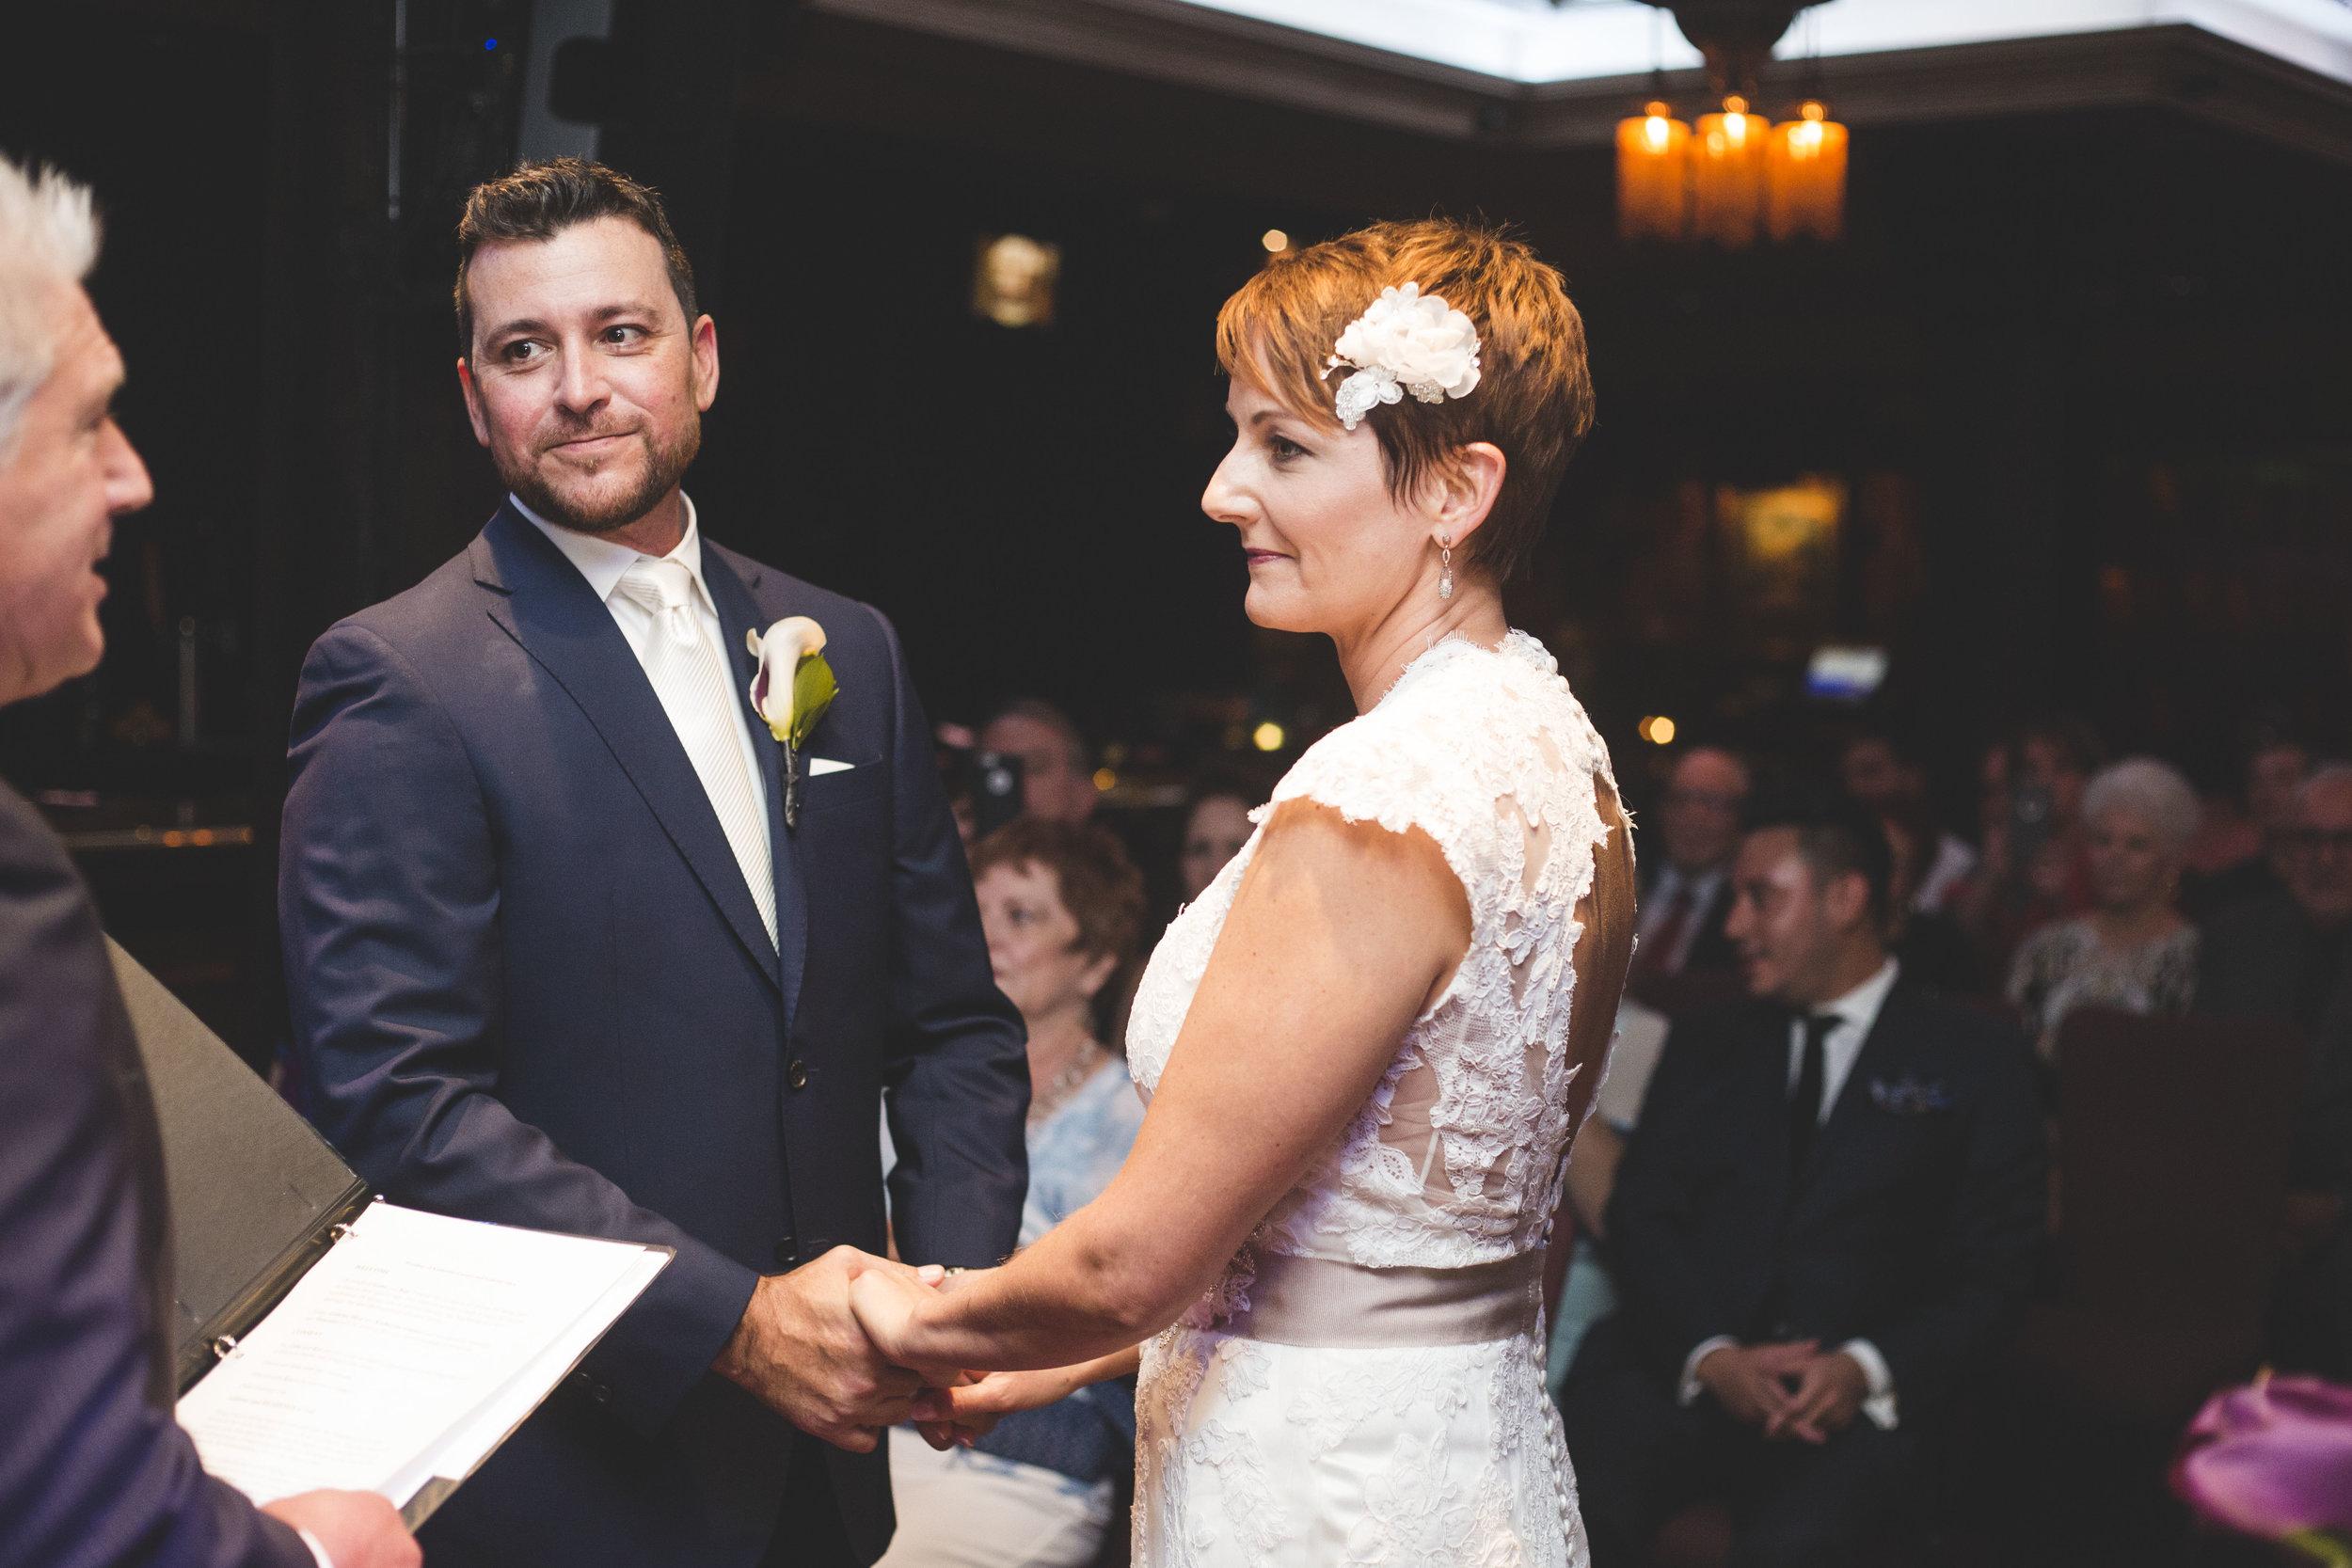 ATGI_Kat and Gabe Wedding 2016_2S8A5306.jpg